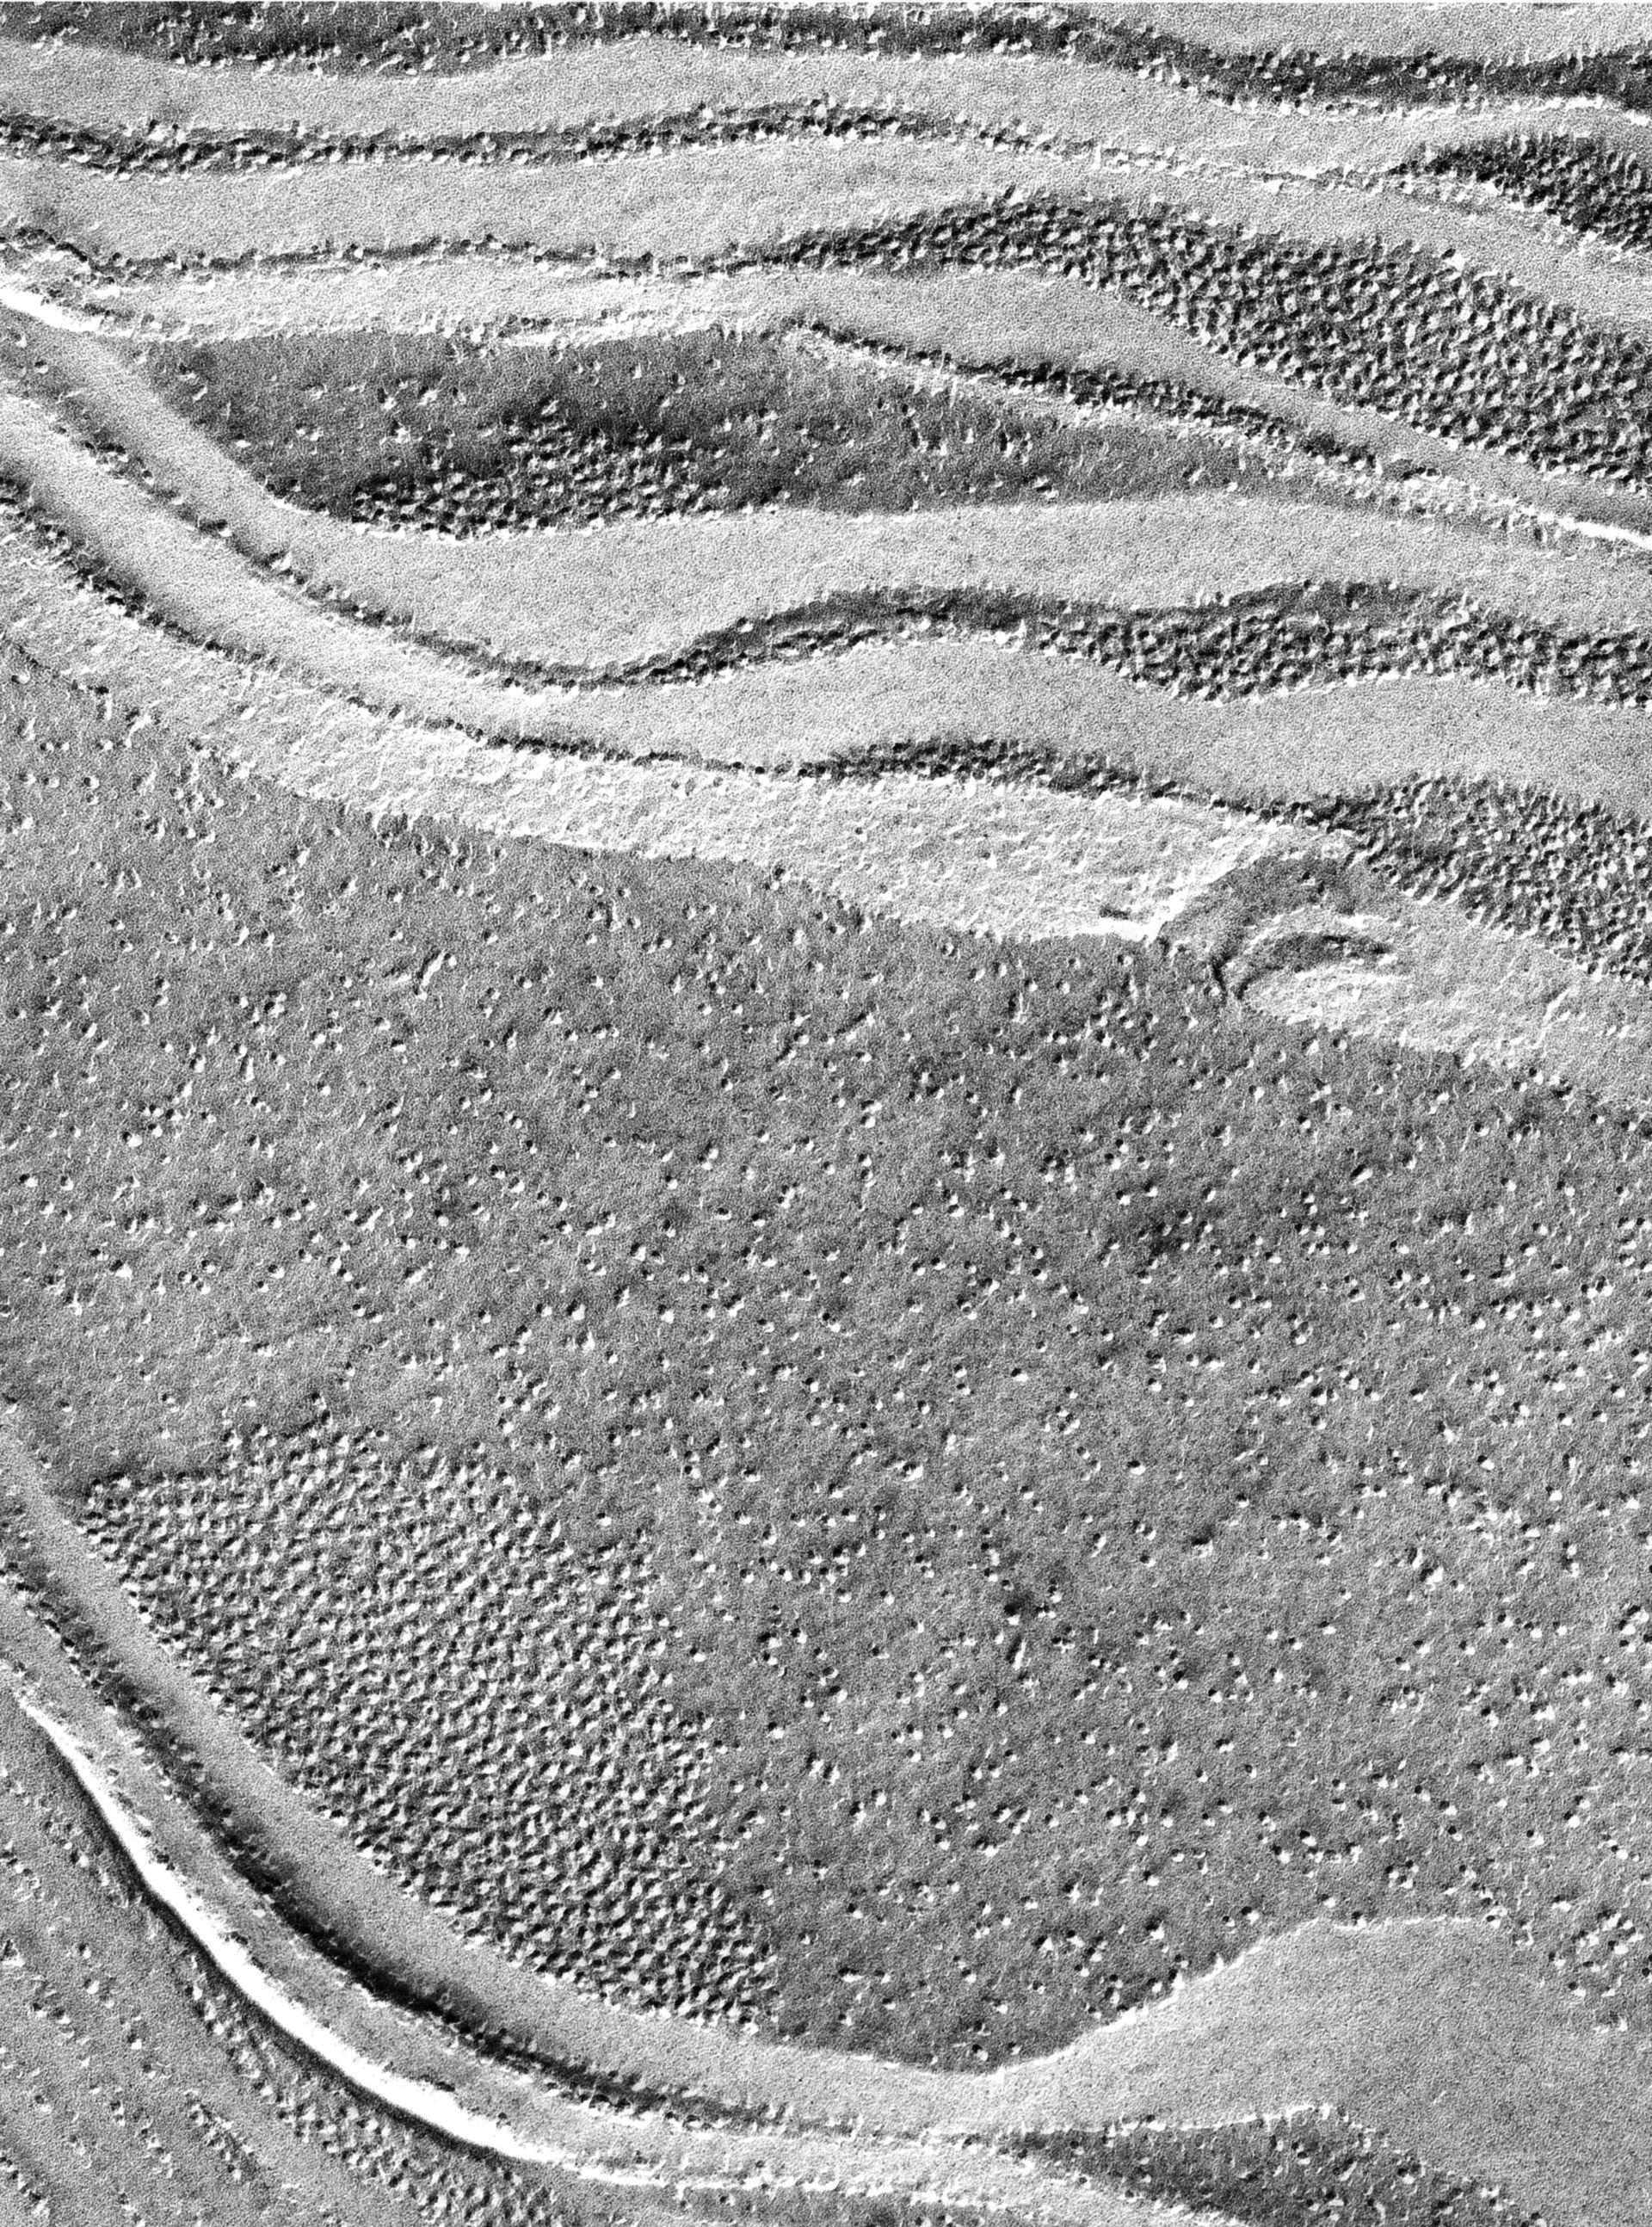 Prochloron (Thylakoid) - CIL:16461